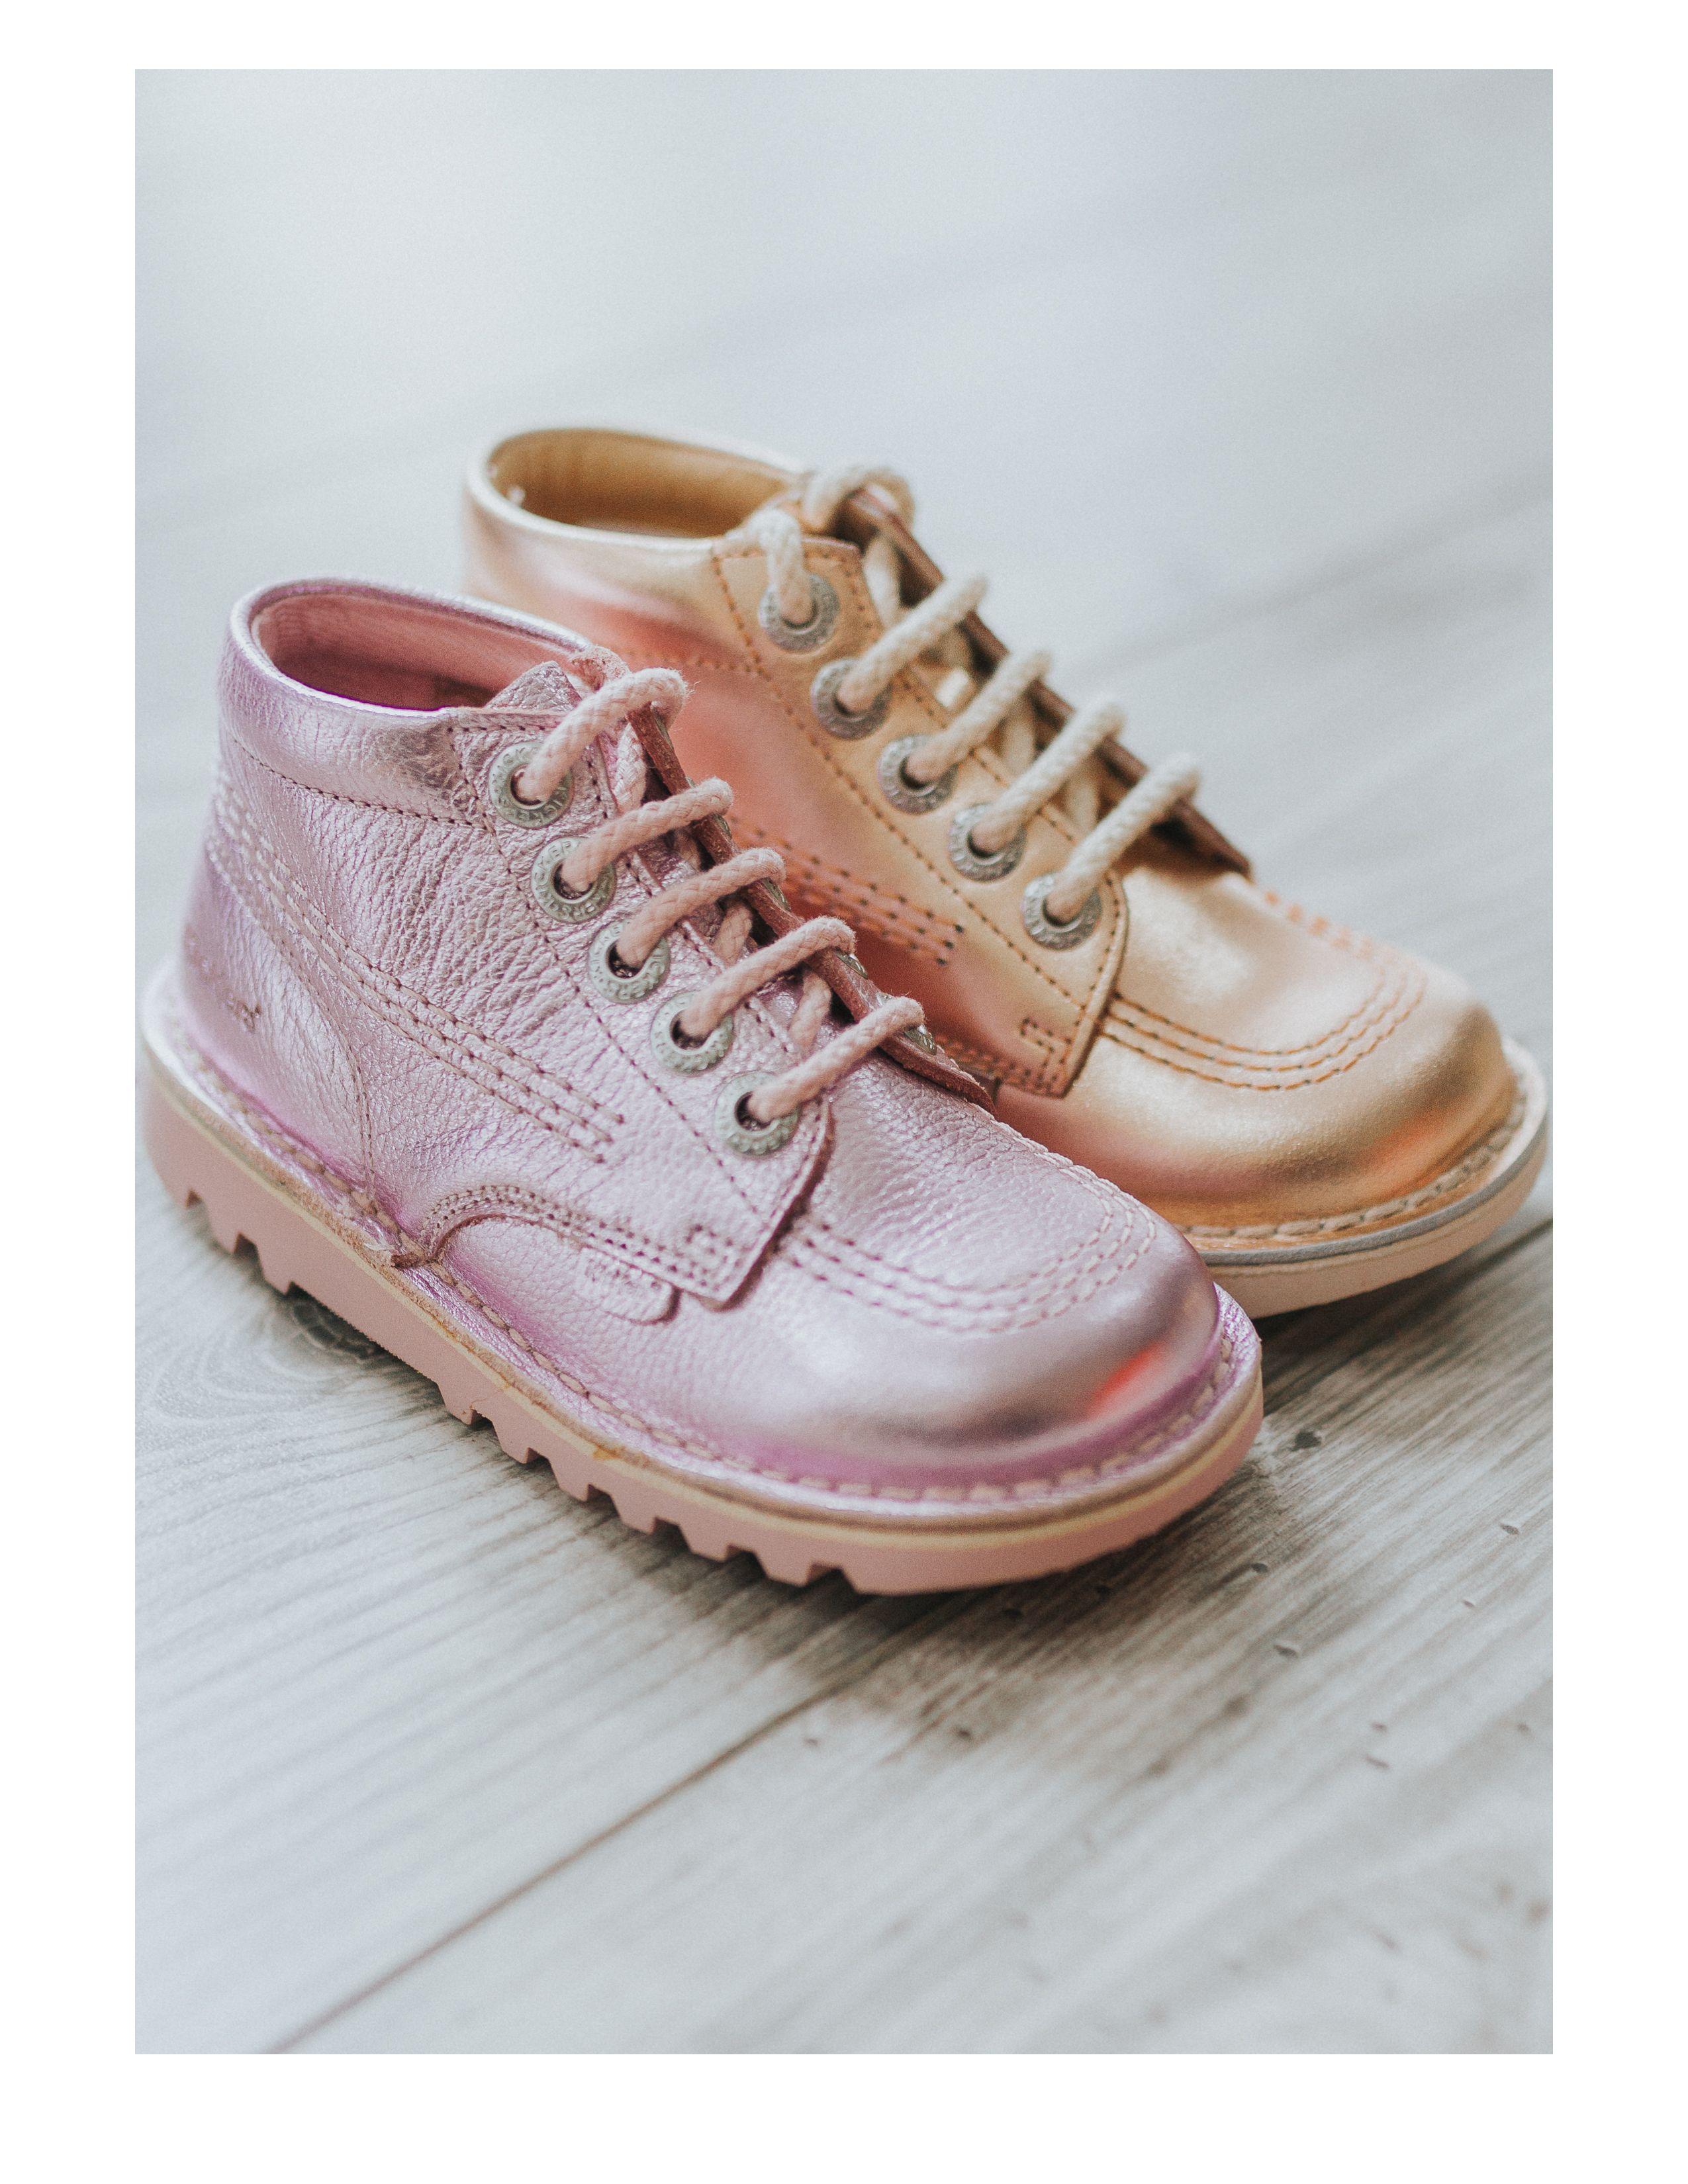 81b1c4c6ecb6 KicKers Kick Hi Infant Metallic Boots